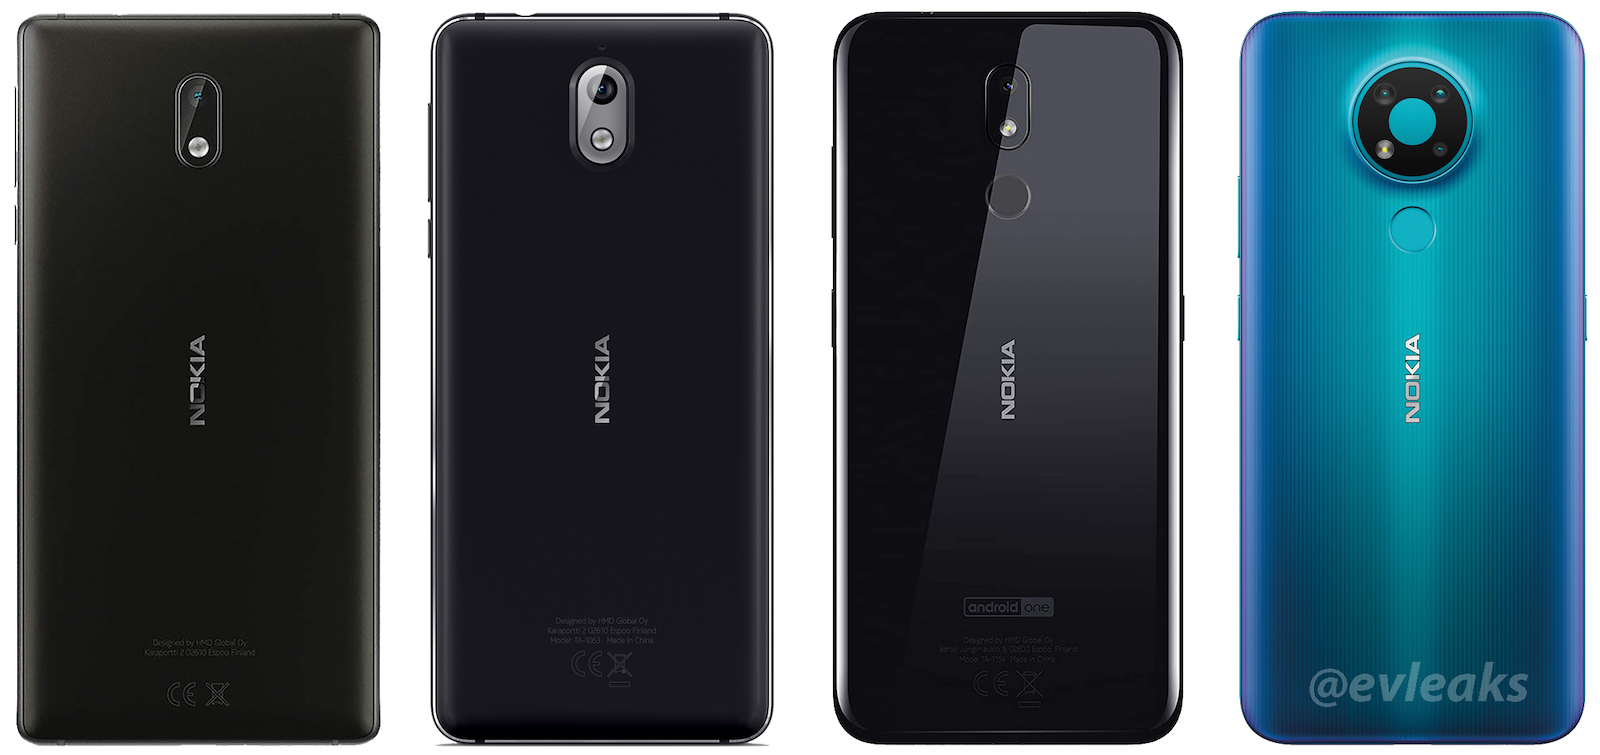 Nokia 3 Evolution